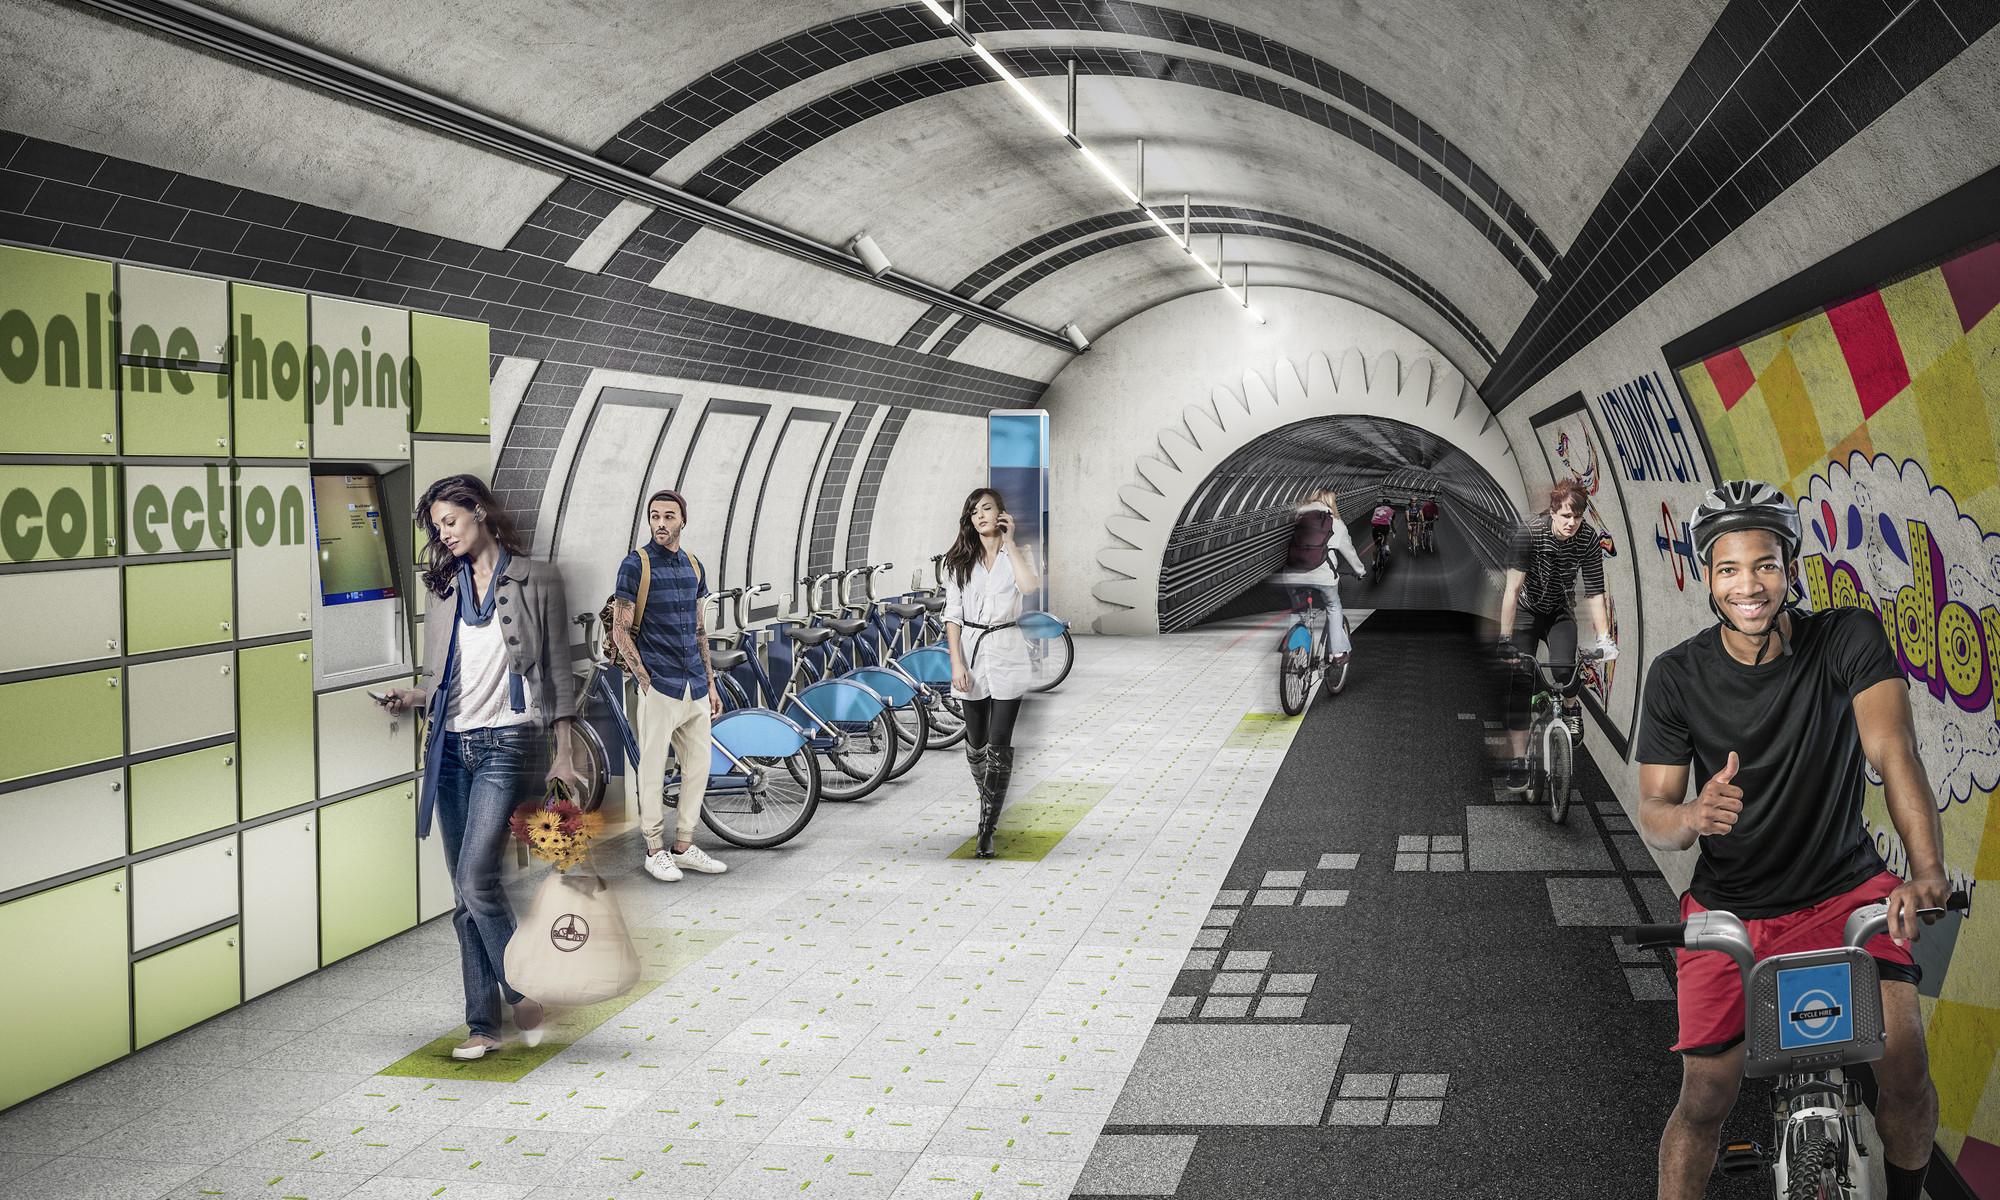 London Underline: Gensler propõe rede de transporte subterrâneo para pedestres e ciclistas em Londres, Túnel de bicicletas. Cortesia de Gensler